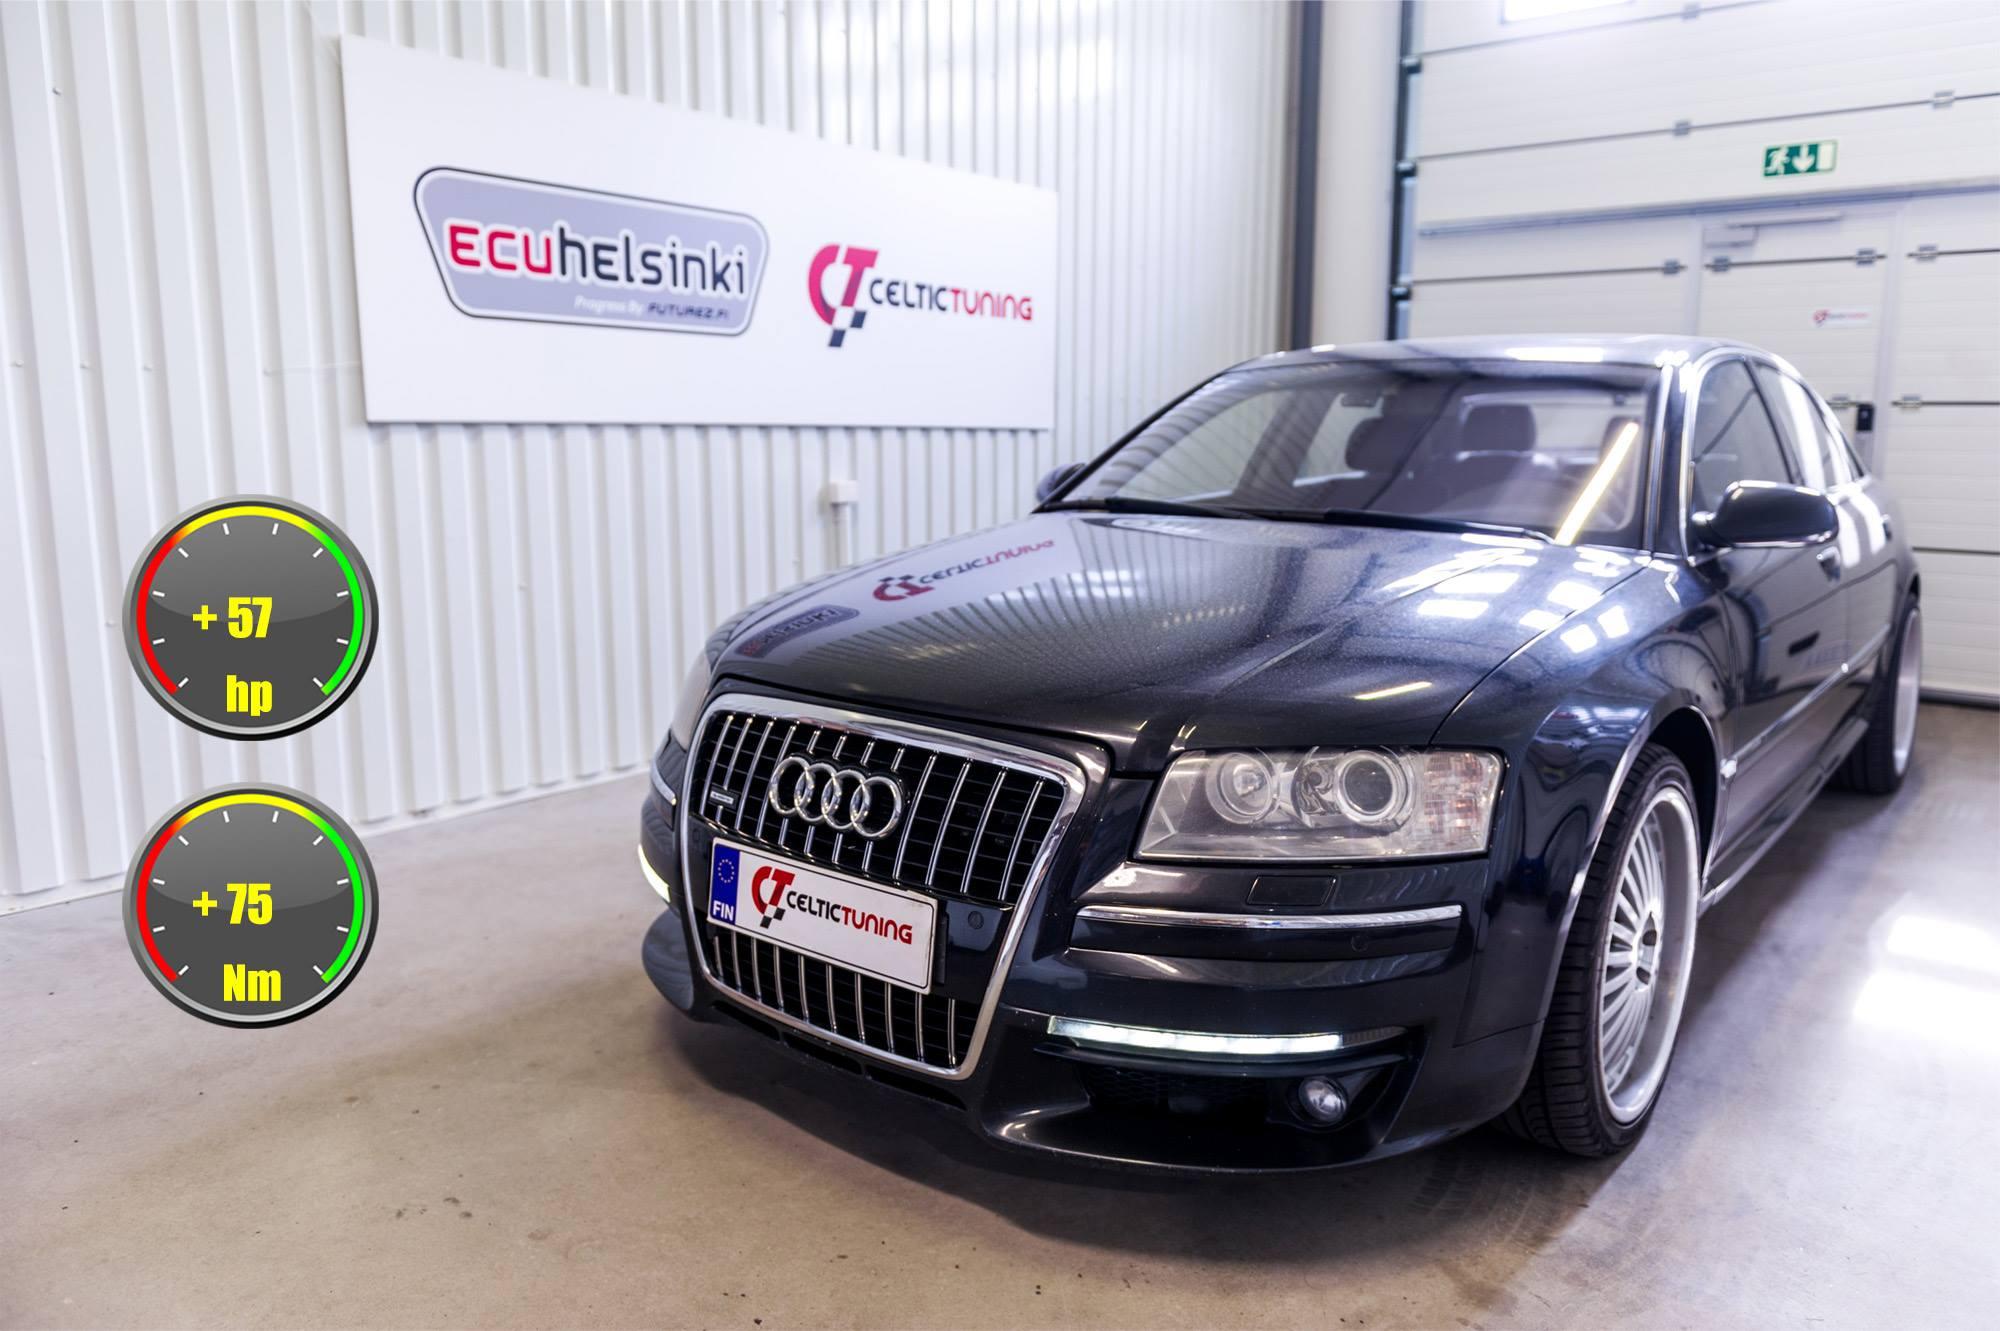 Audi A8 lastutus celtic tuning